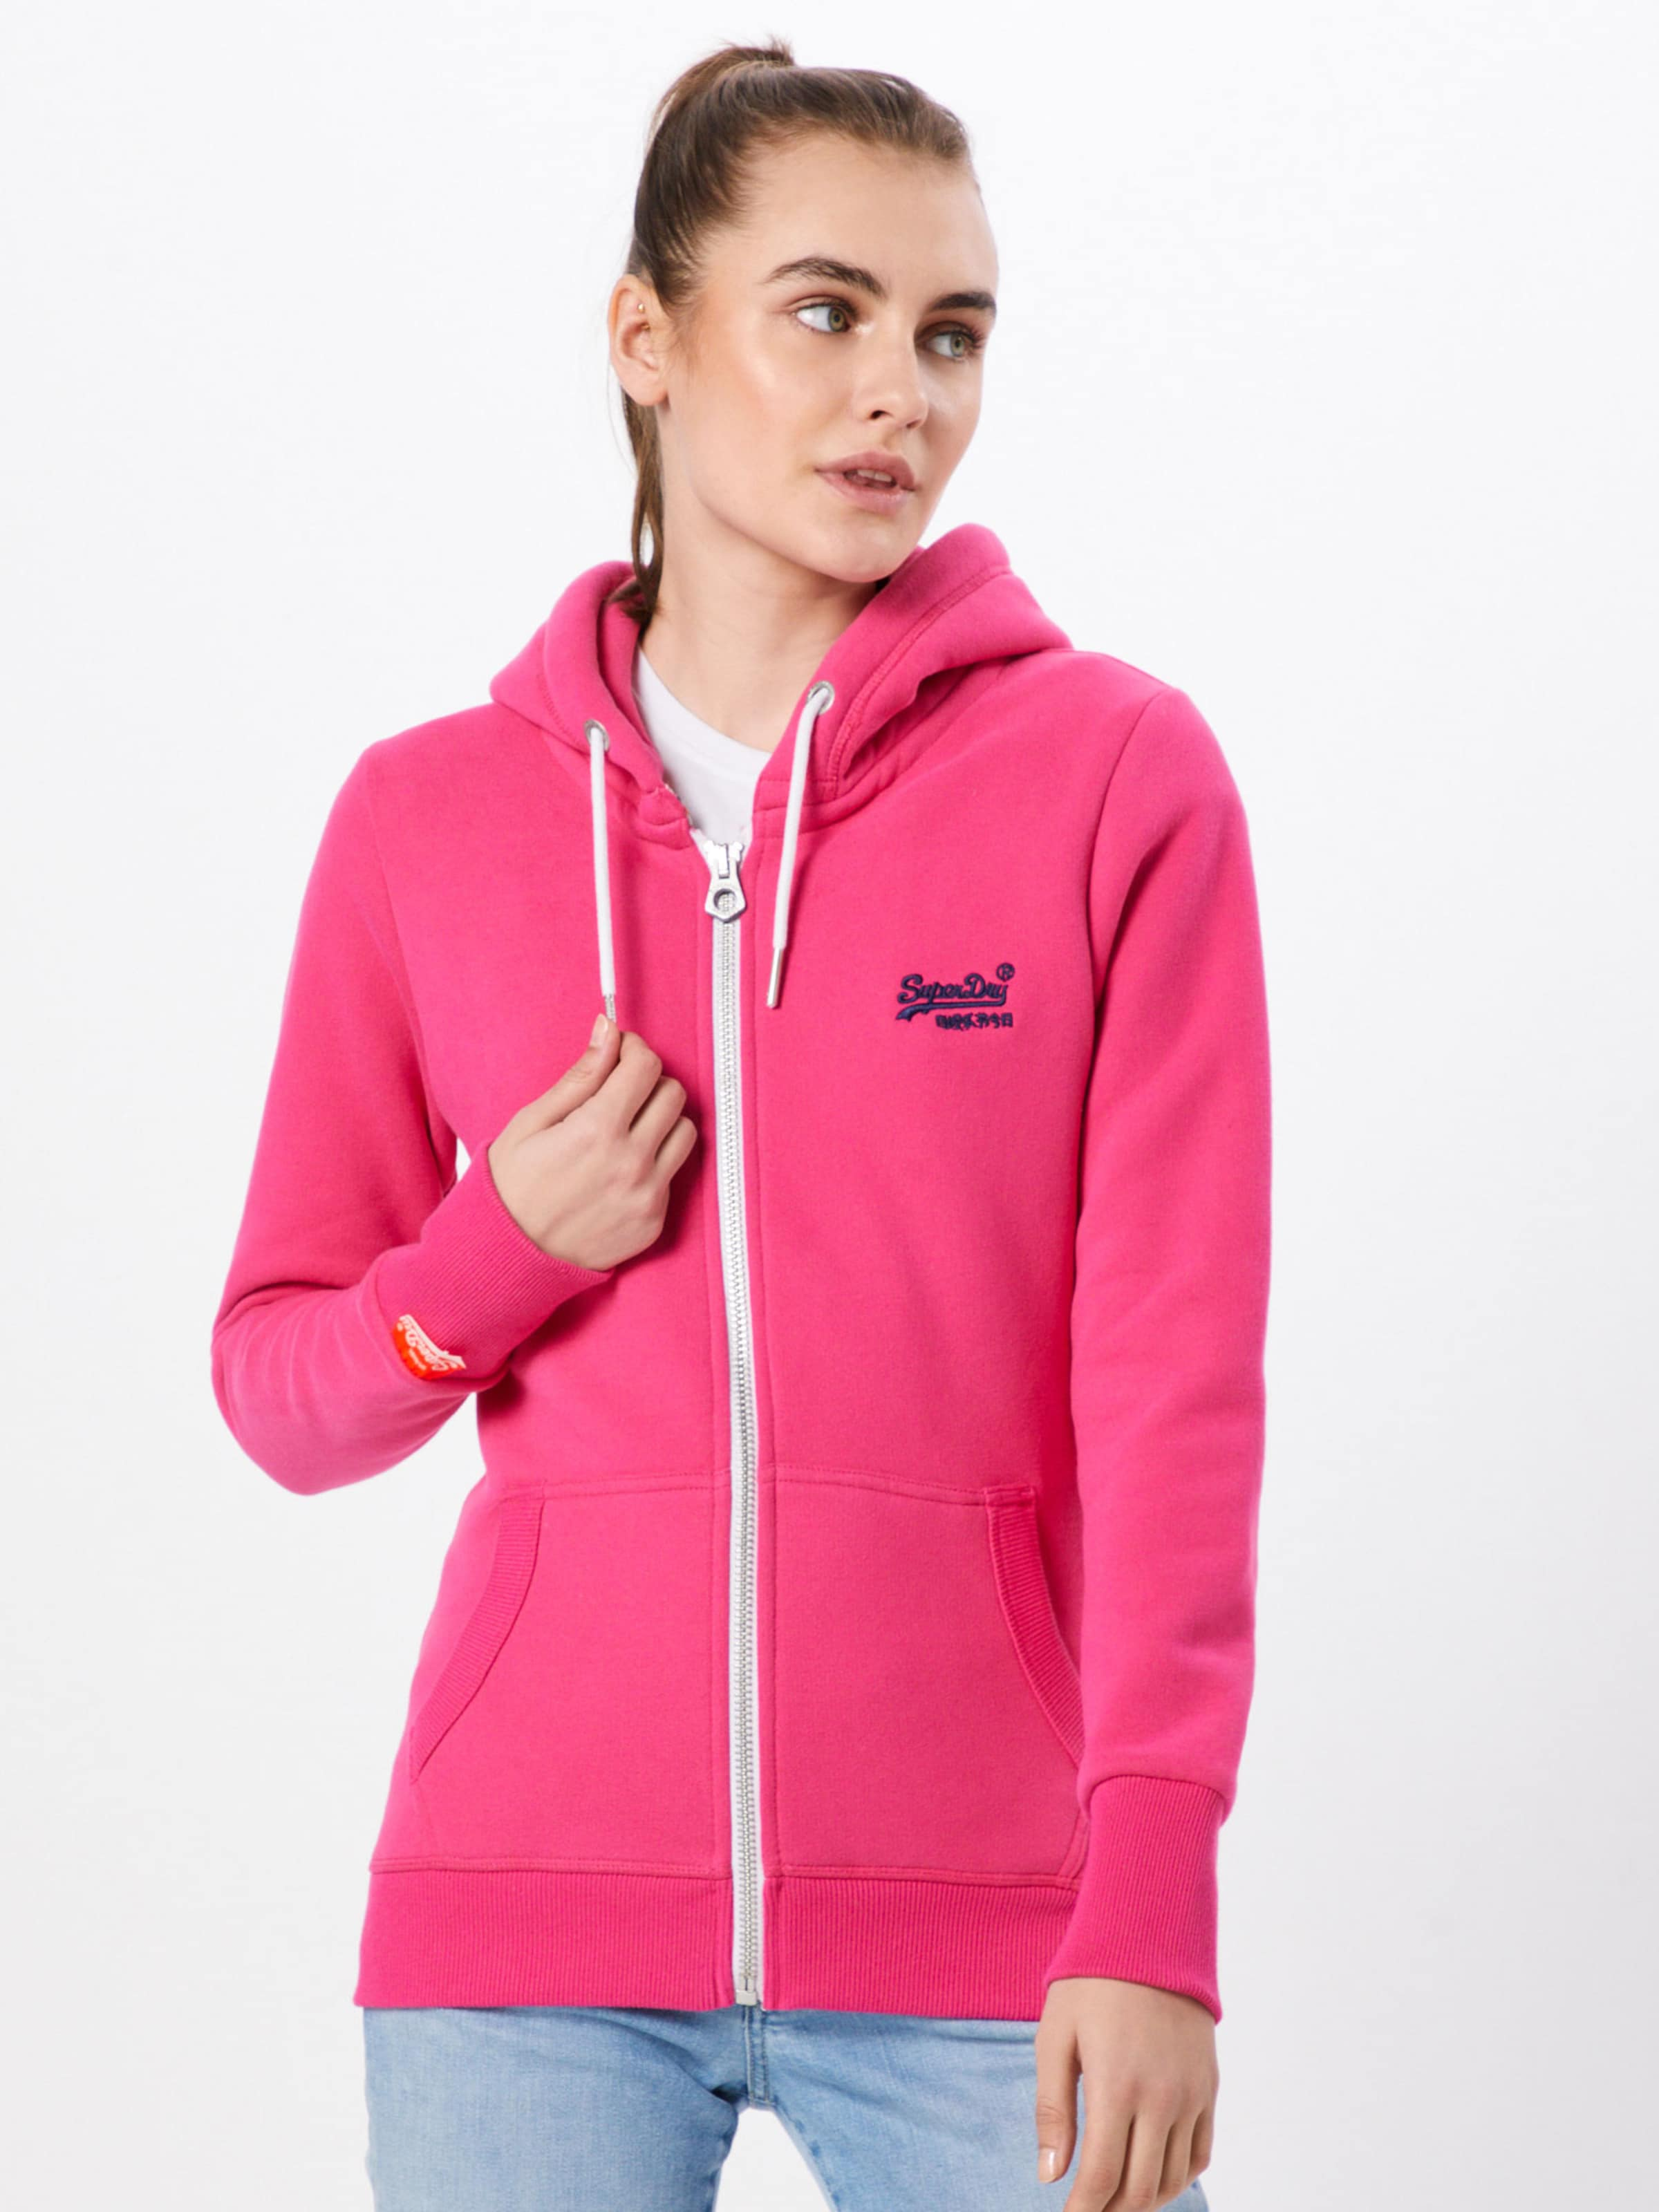 'orange' Pink Superdry Sweatvest Superdry Pink 'orange' 'orange' Sweatvest In Sweatvest In Superdry n0XZkwON8P